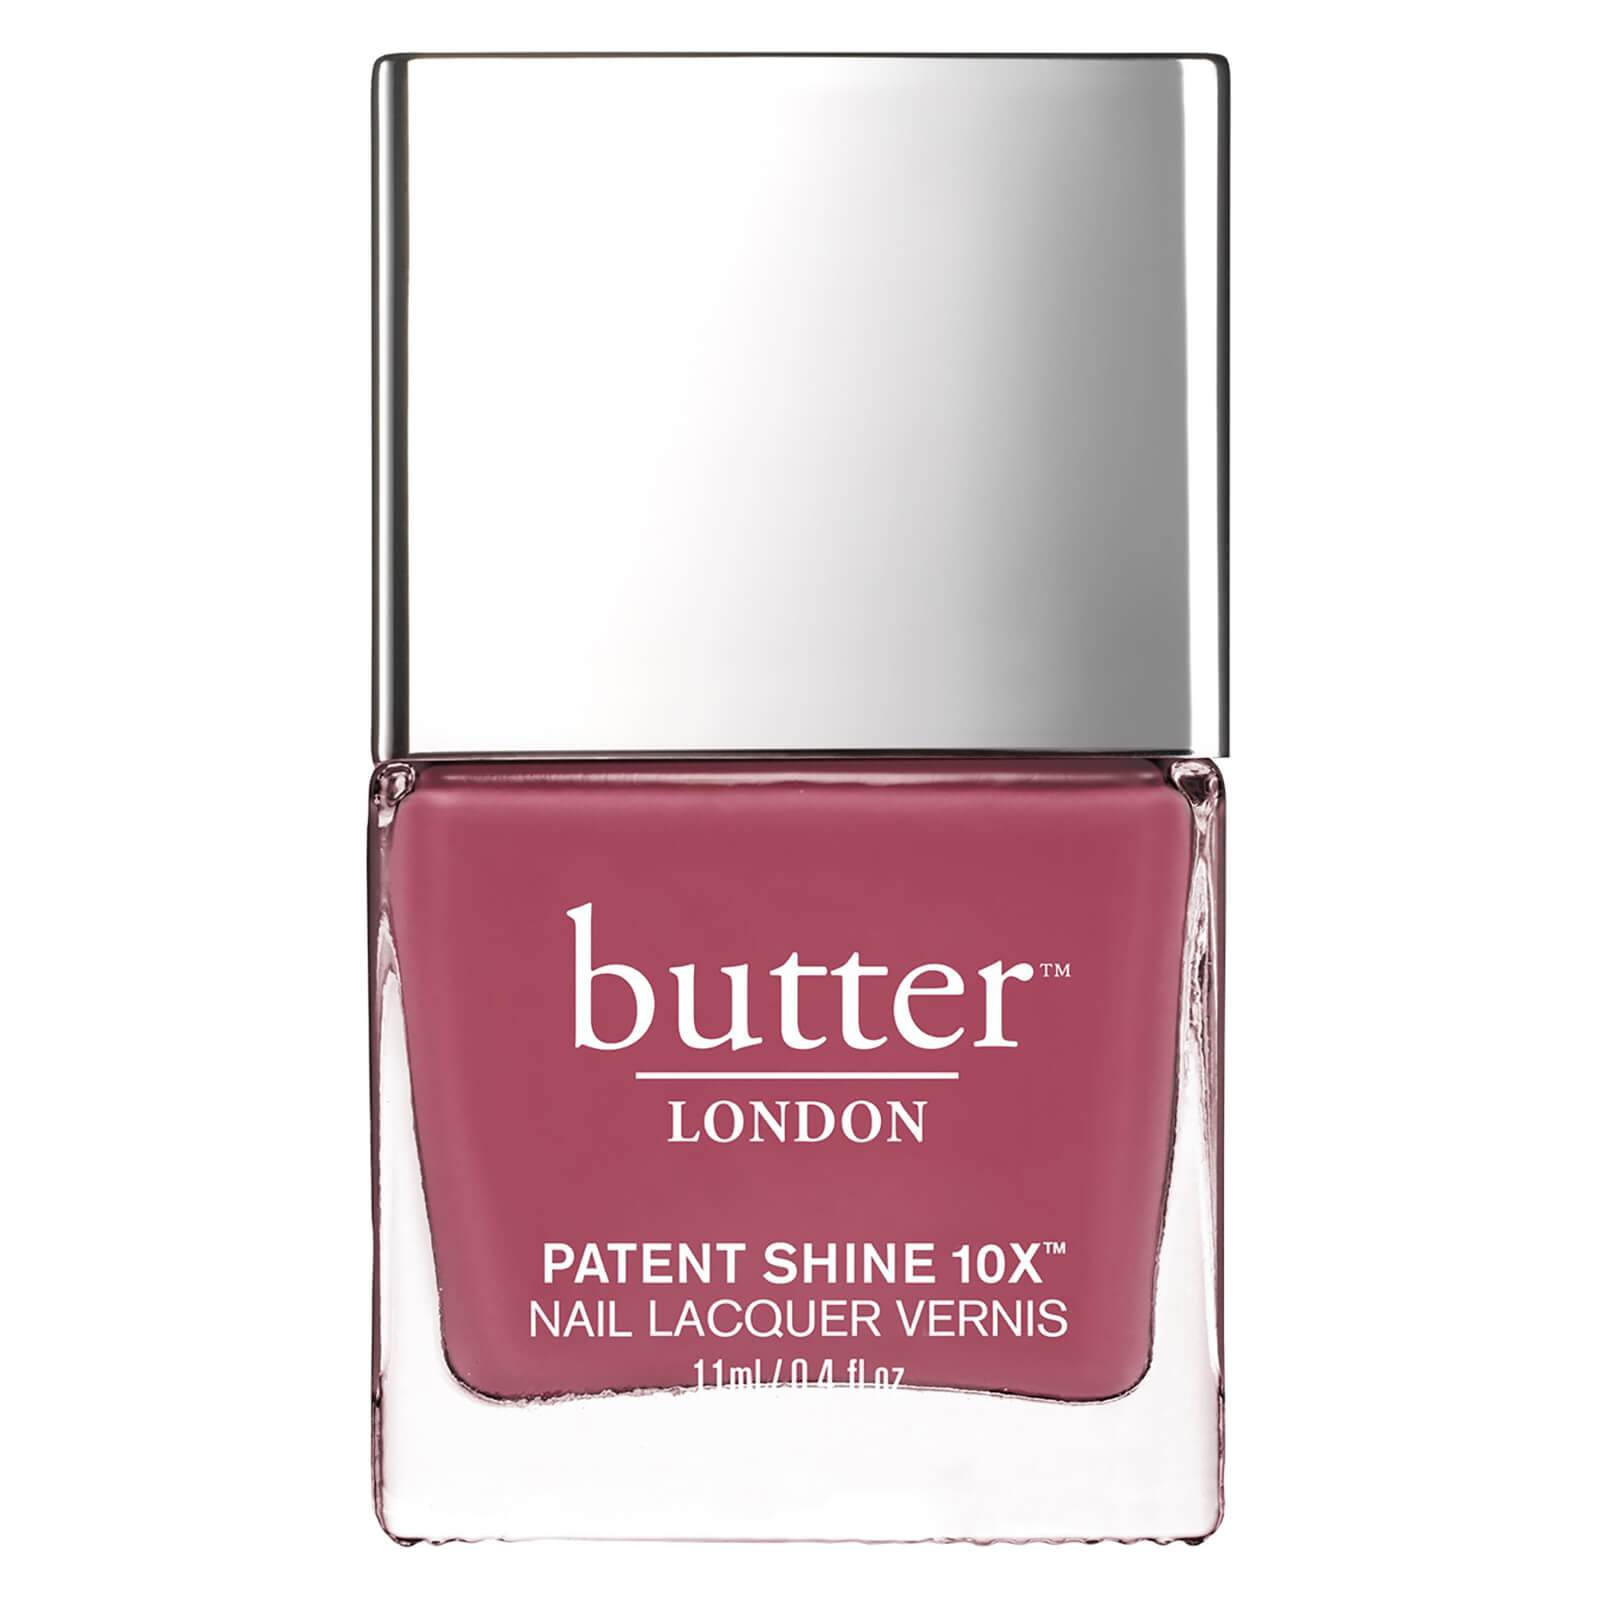 butter LONDON Patent Shine 10X Nail Lacquer 11ml - Dearie Me!